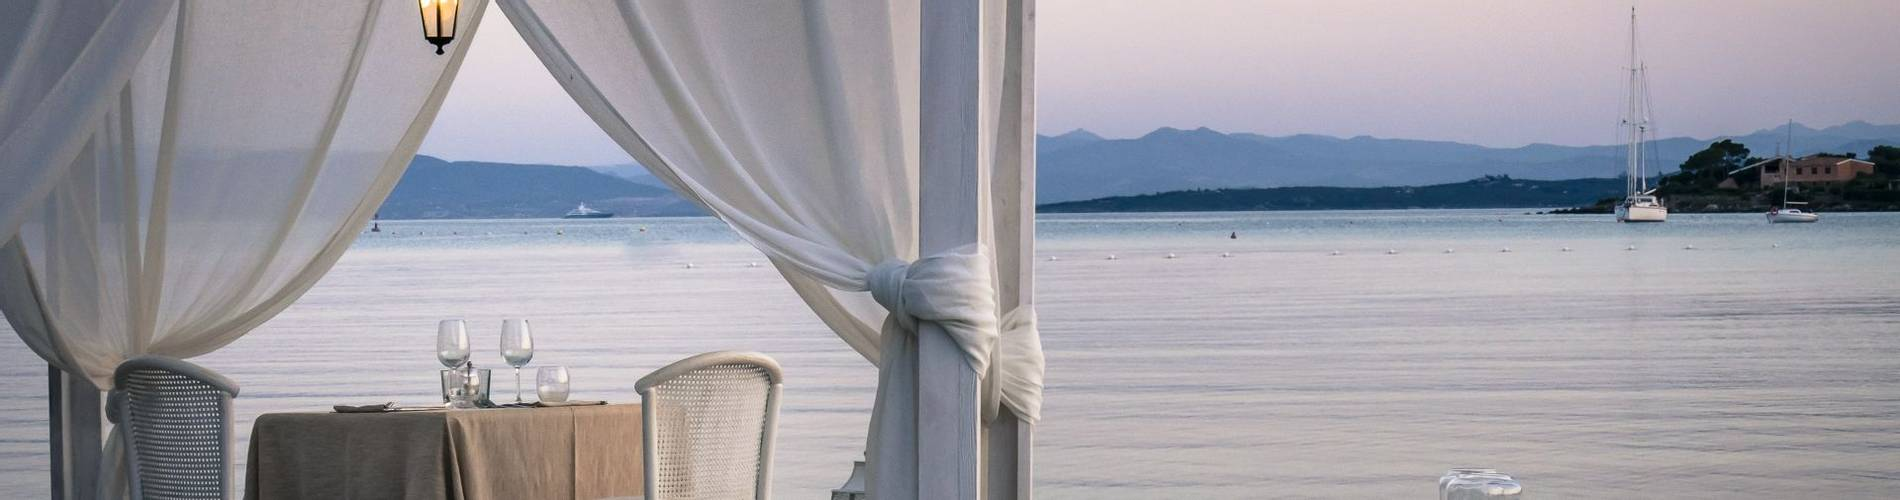 Gabbiano Azzurro Hotel _ Suites Sardinia - beach dinner 1.jpg